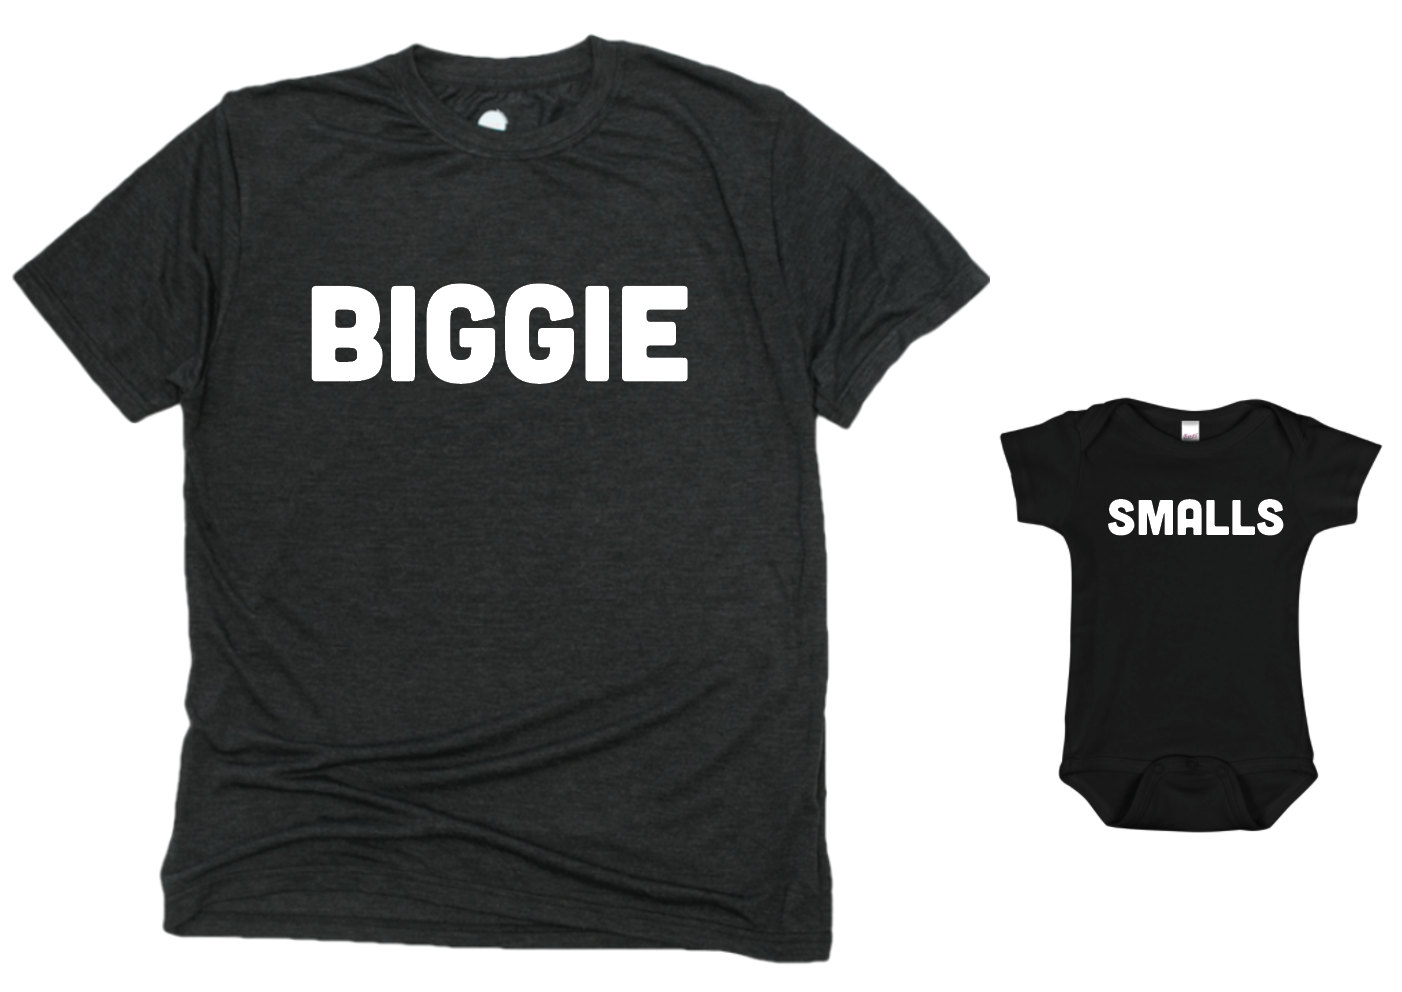 ce37ff996 Biggie Smalls Matching Kids Tee/Baby Onesie (SMALLS TEE) | Saturday ...